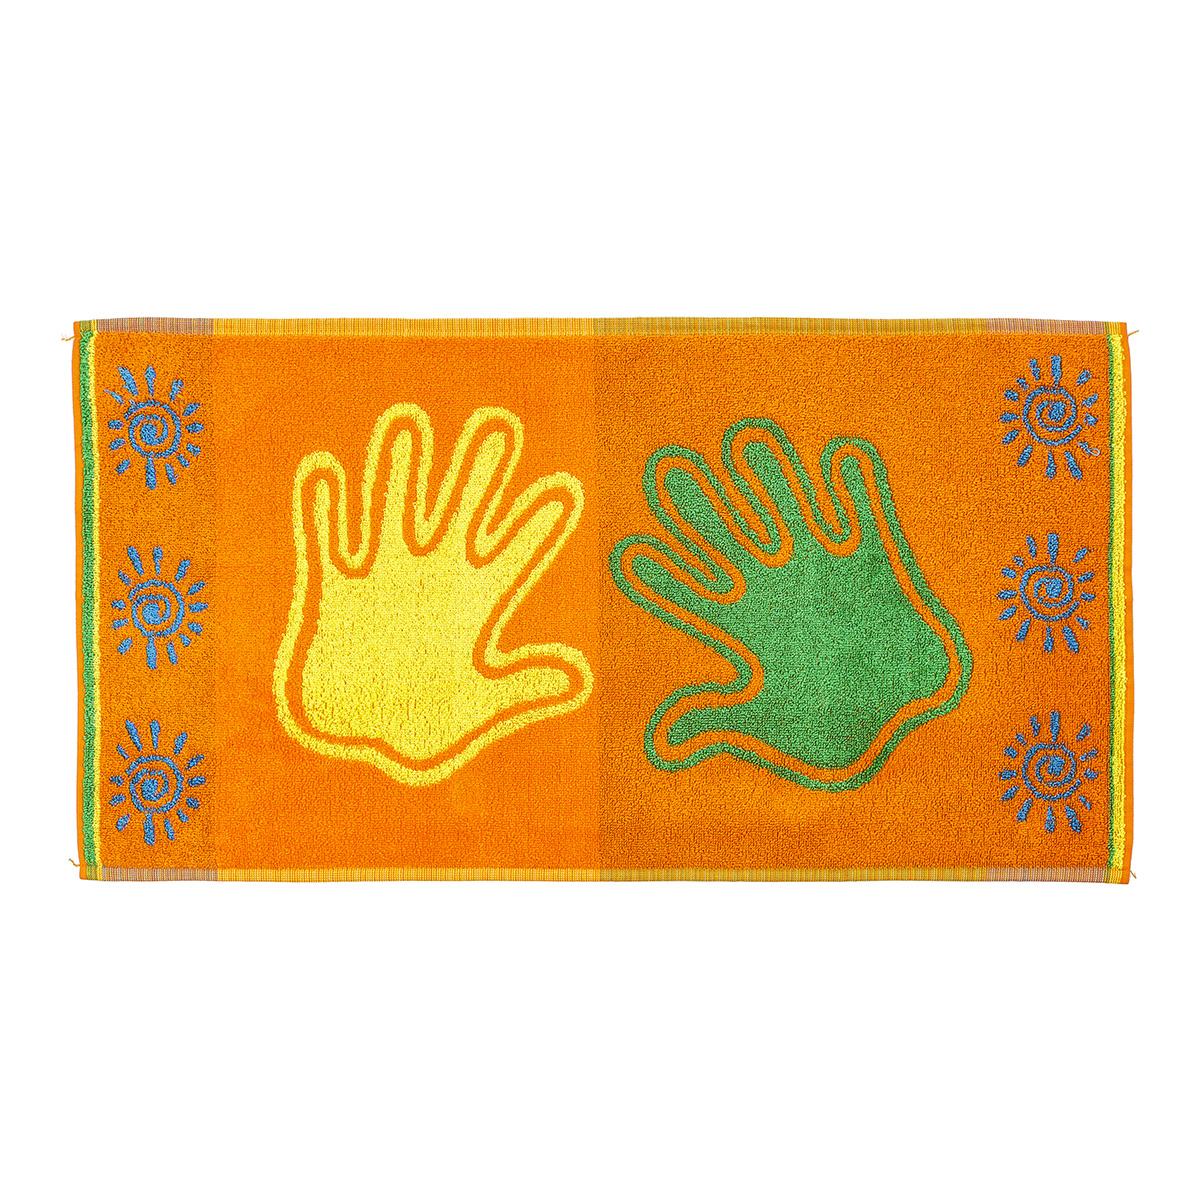 Полотенце Для рук арт. 0574, размер 40х70 см.Махровые полотенца<br>Плотность ткани: 420 г/кв. м<br><br>Тип: Полотенце<br>Размер: 40х70<br>Материал: Махра